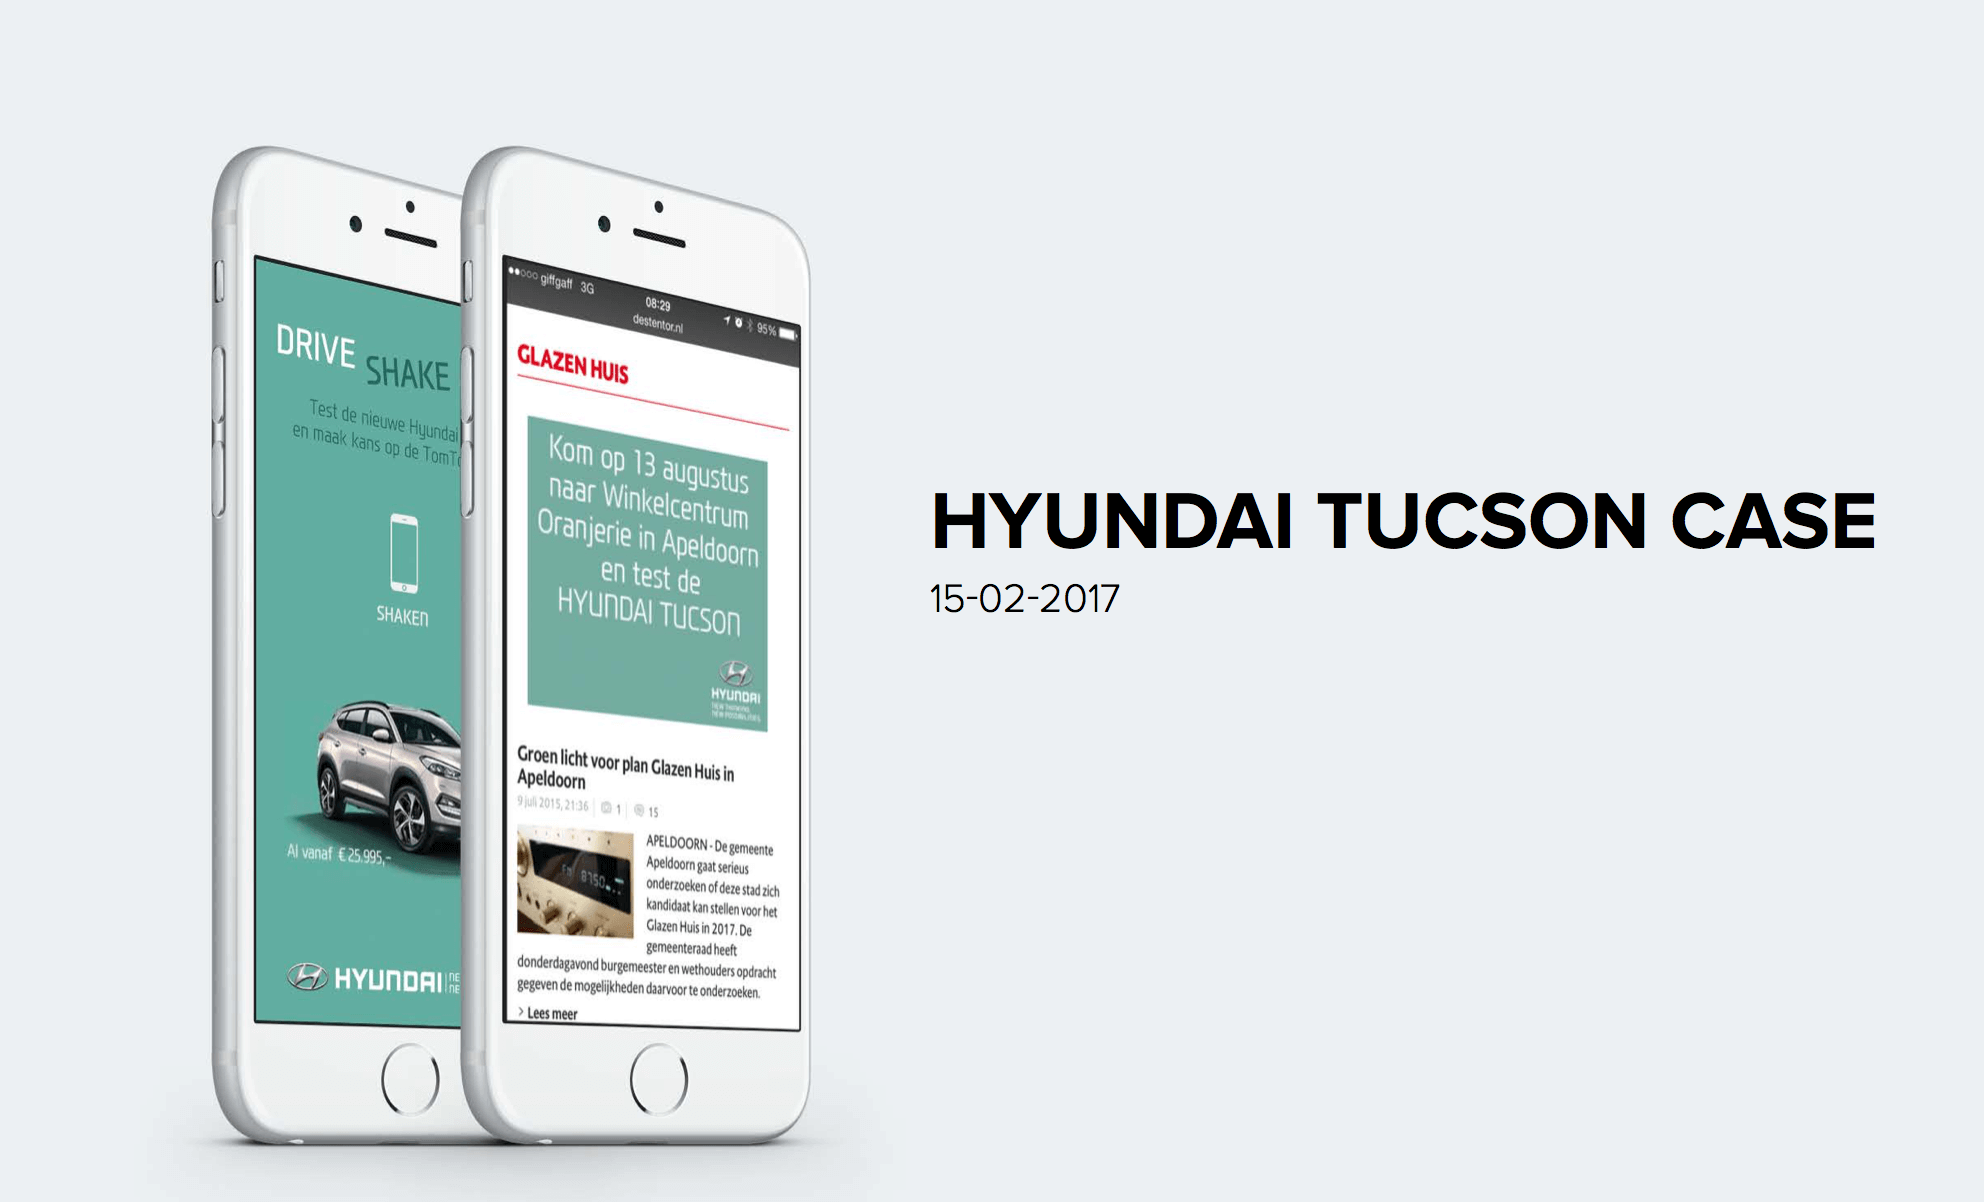 Hyundai Tucson Case